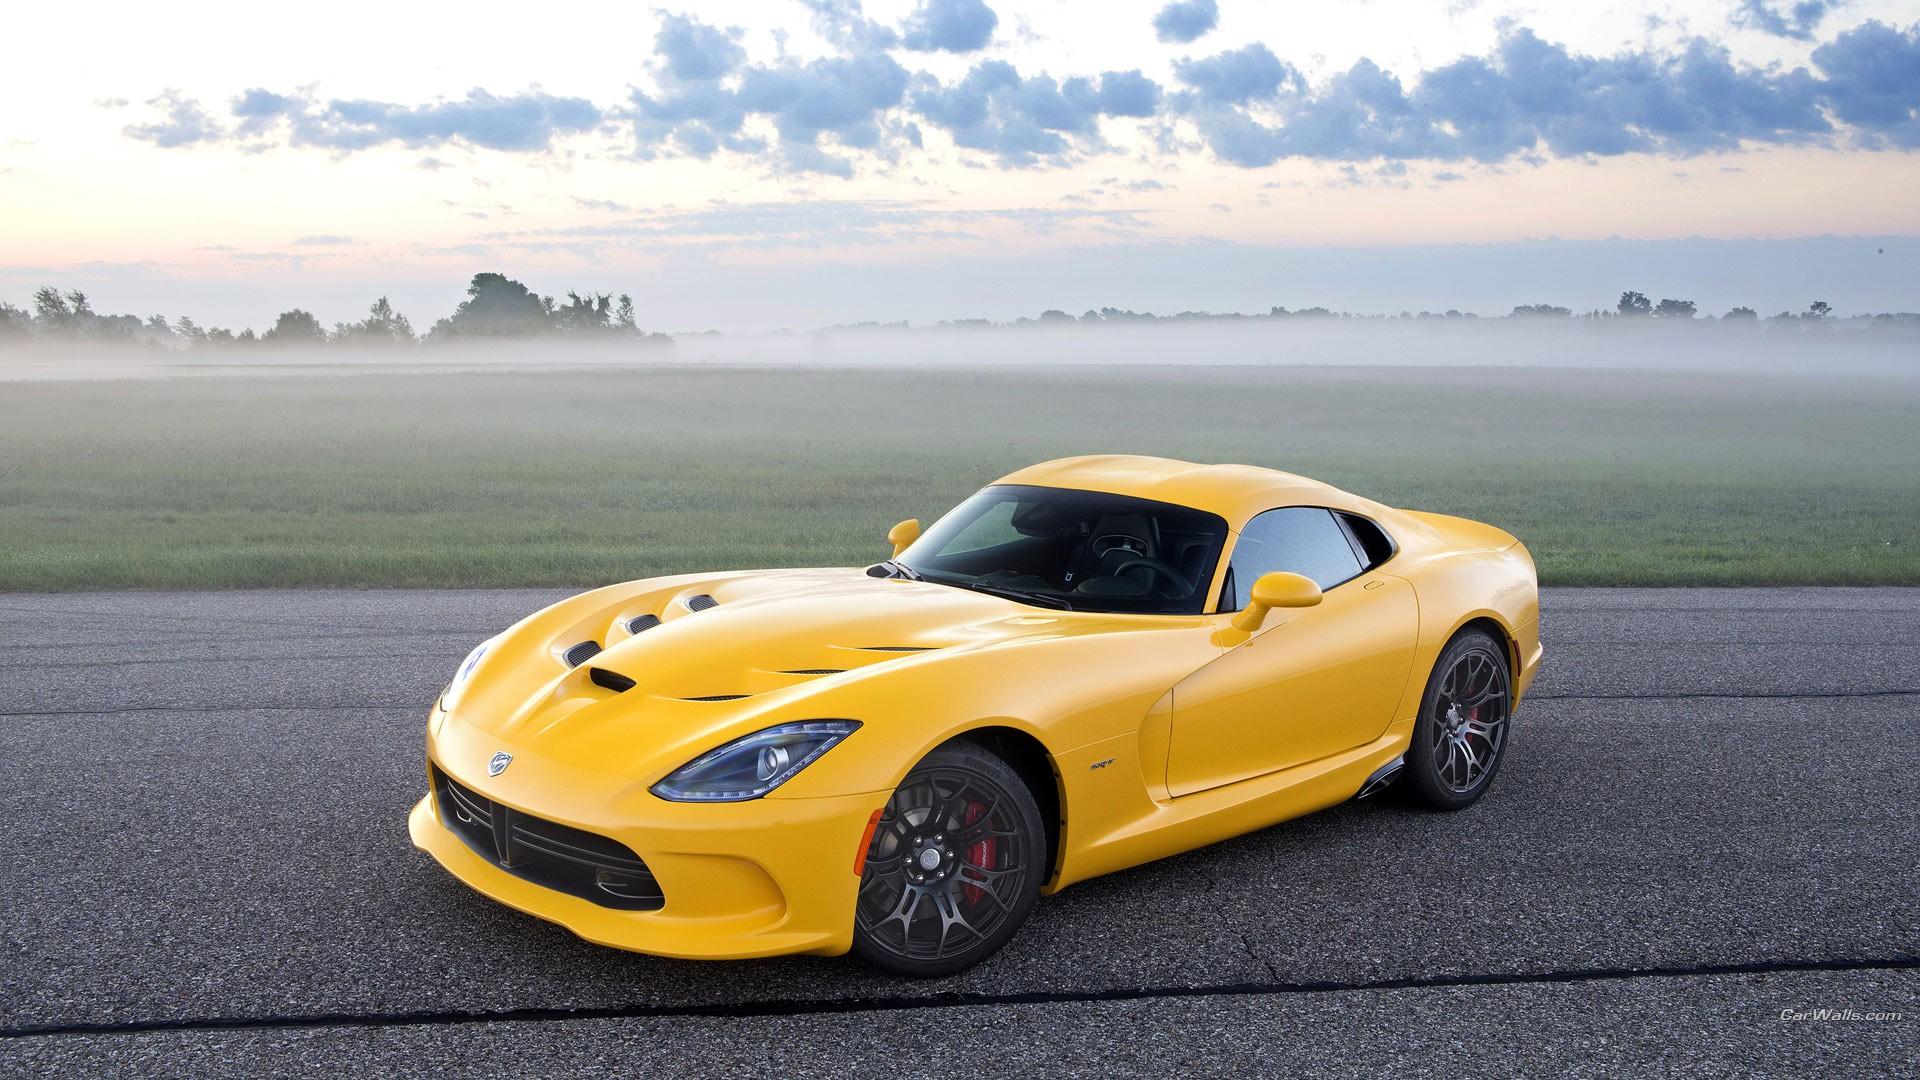 Dodge viper 2016 hd cars 4k wallpapers images - Dodge car 4k wallpaper ...